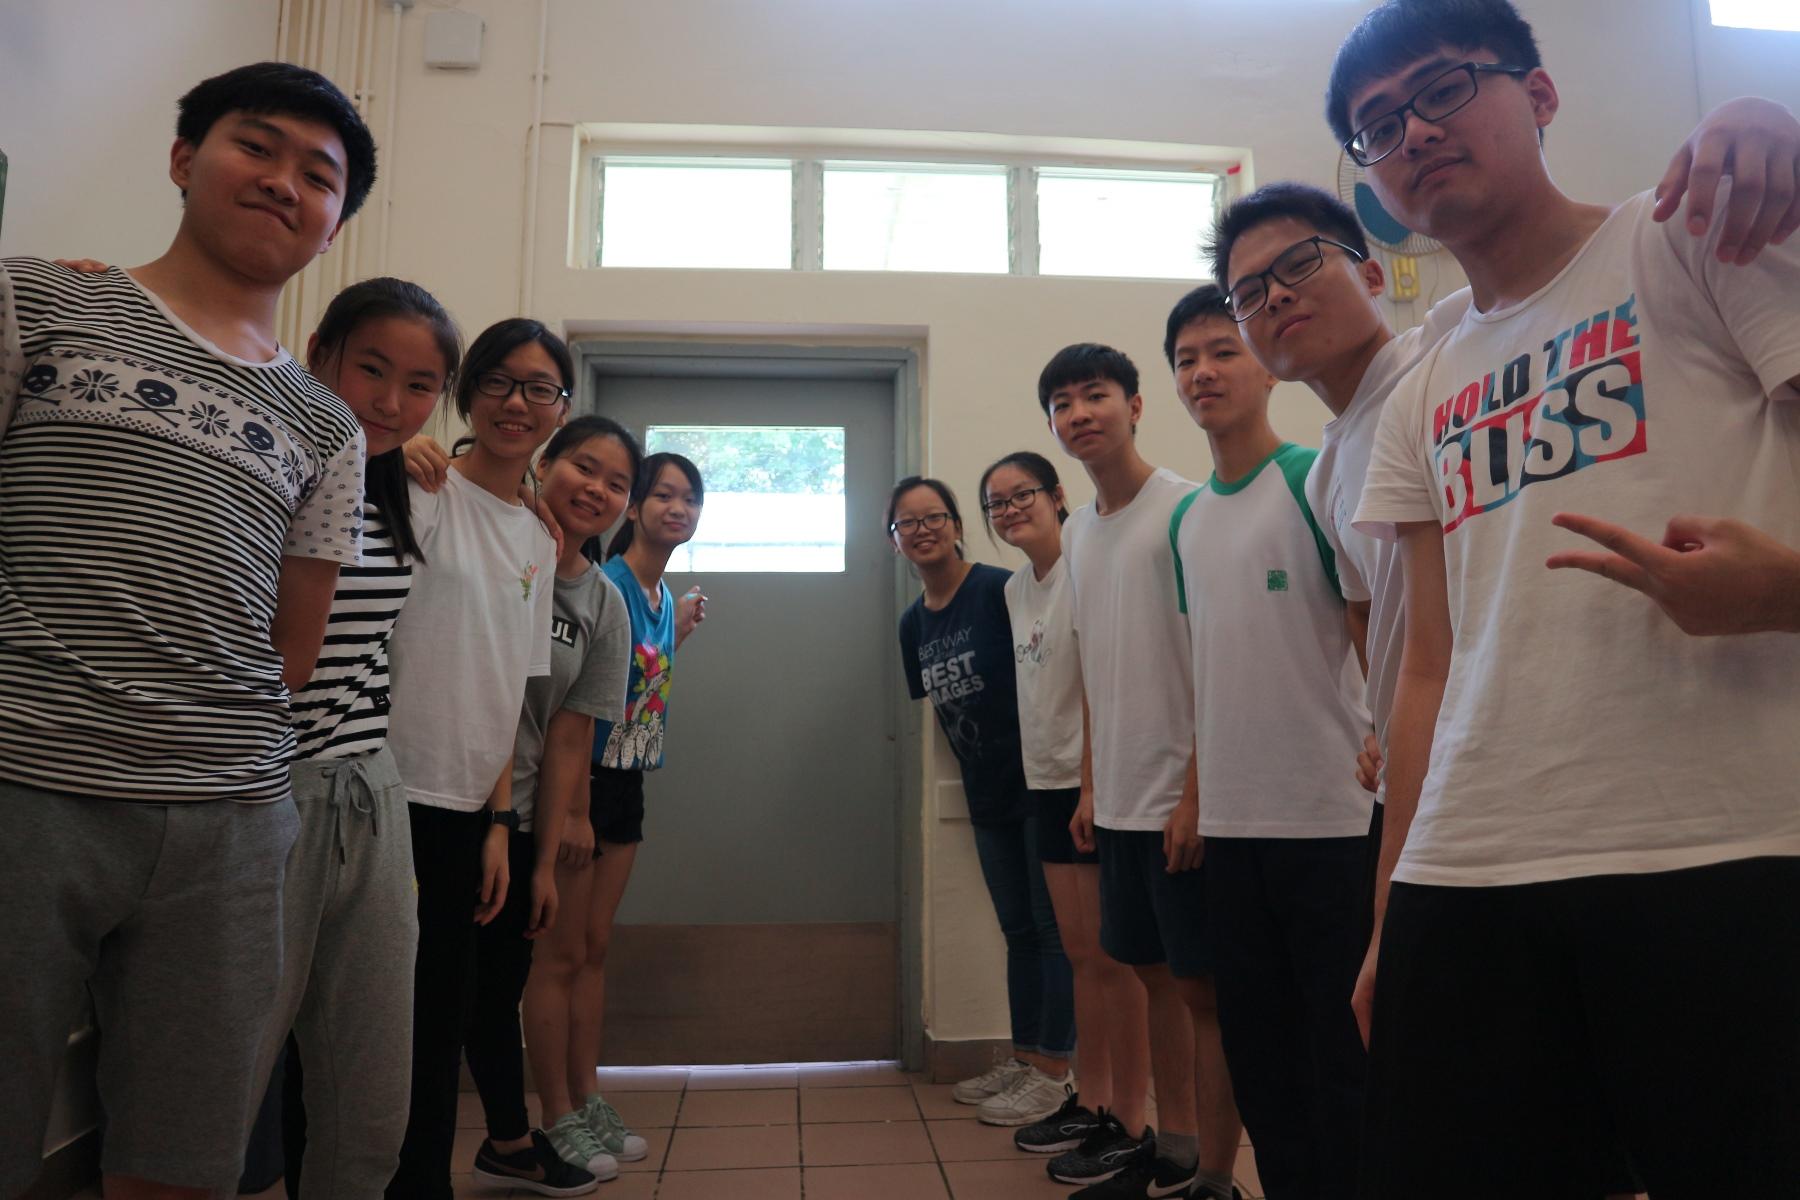 http://www.npc.edu.hk/sites/default/files/img_3397.jpg